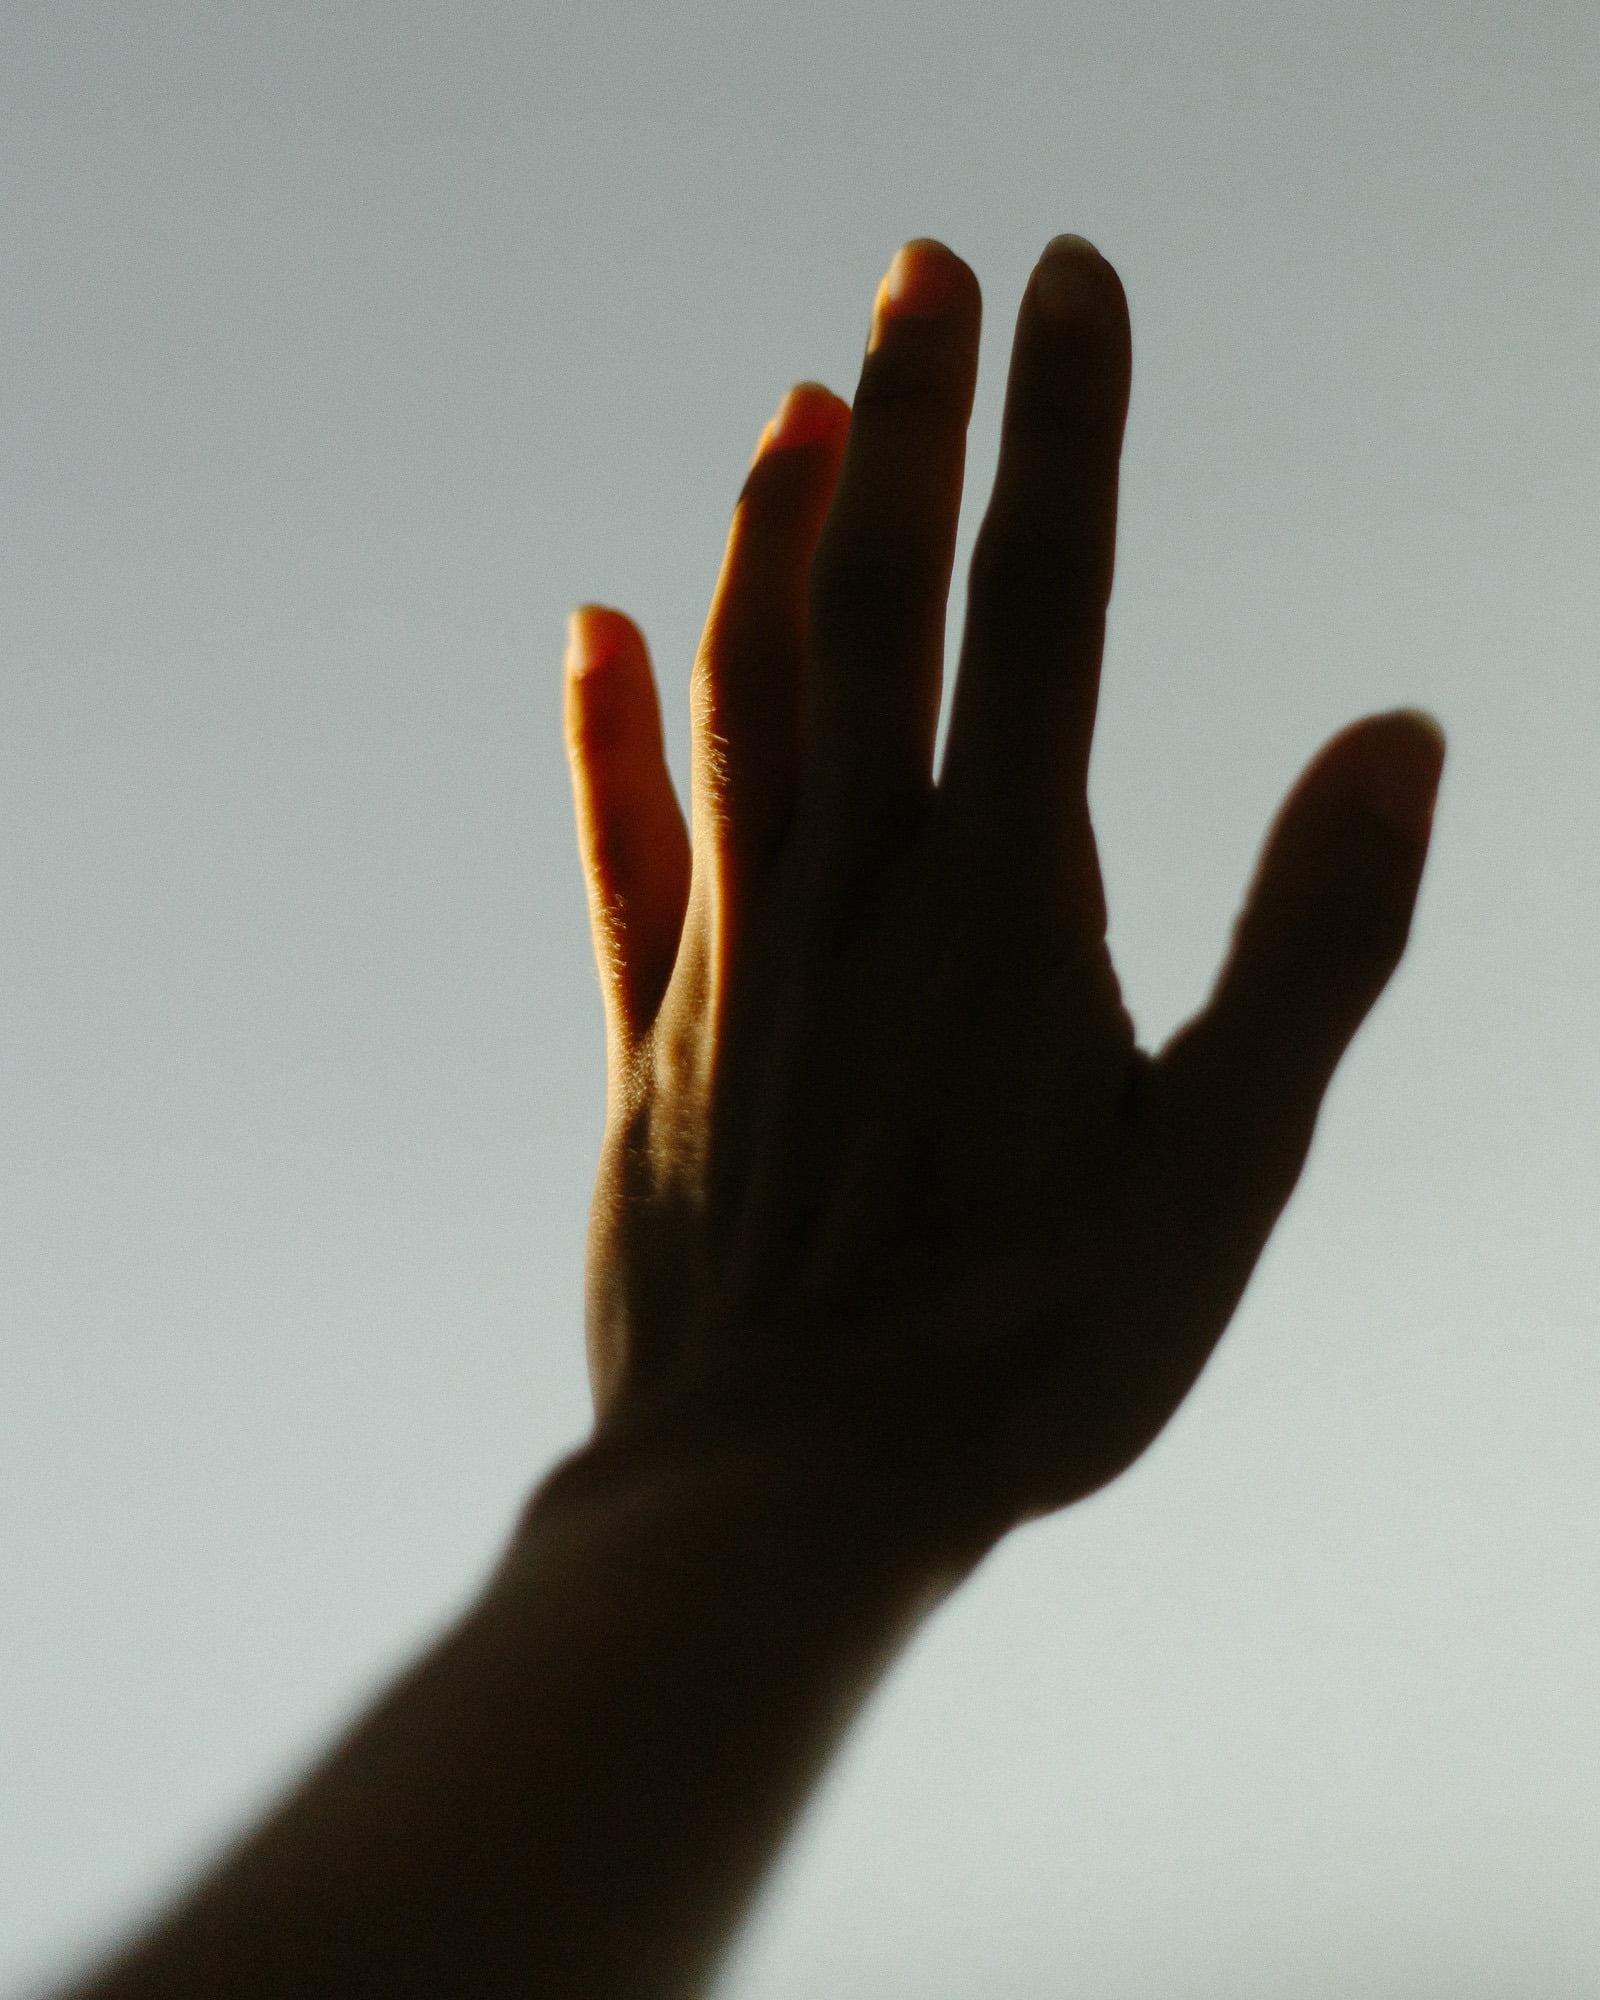 Sky, Gesture, Thumb, Finger